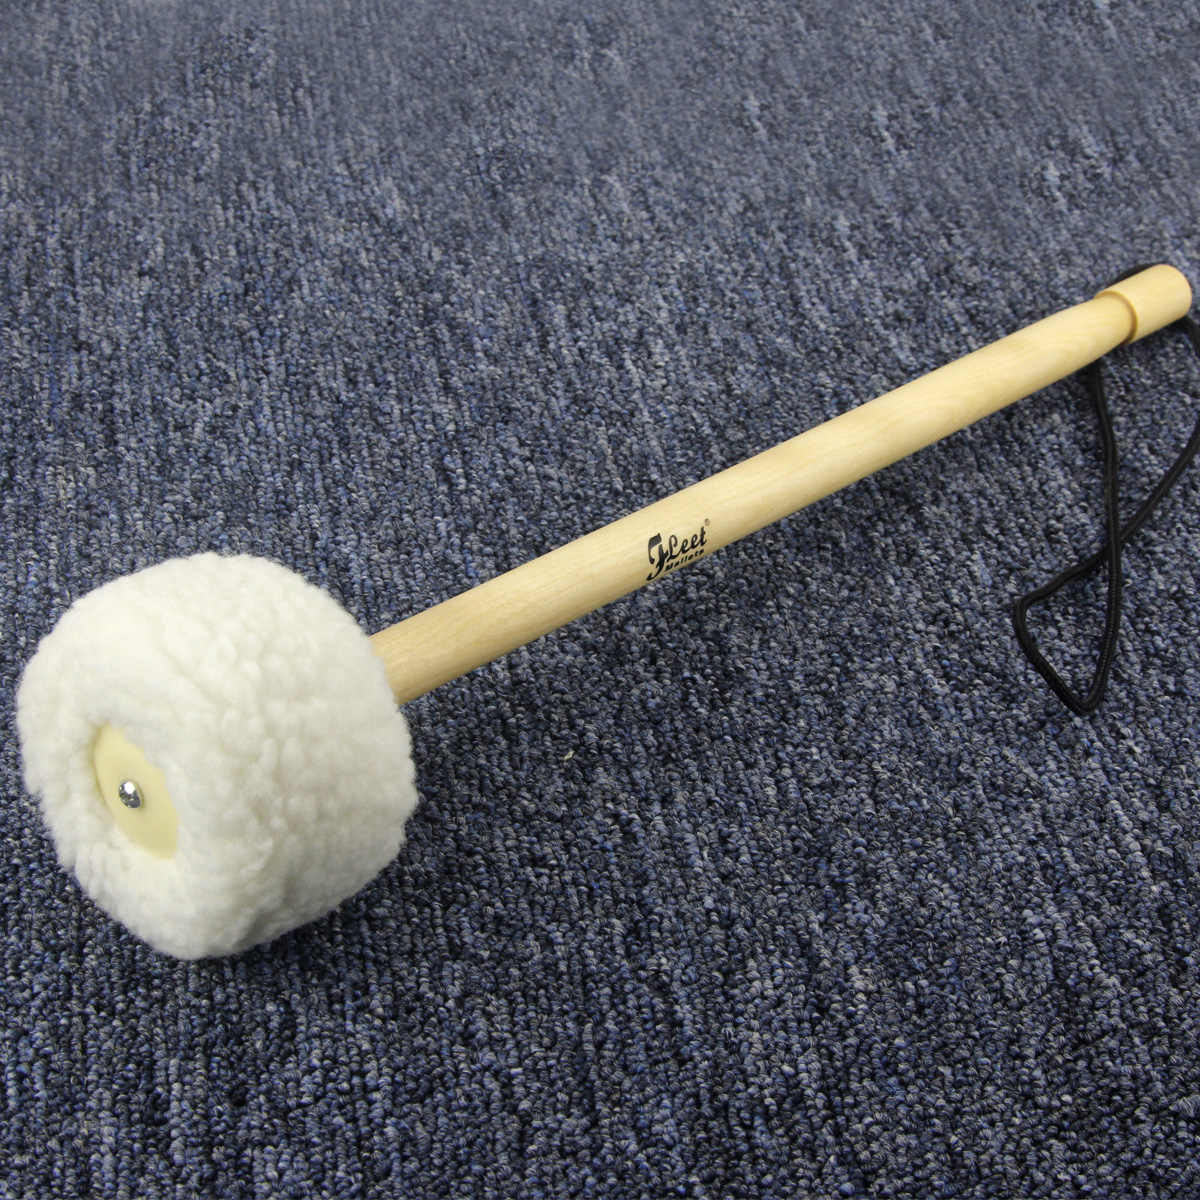 Gefilzte Holz  Mallet tibetische Klangschale Gong großes Werkzeug